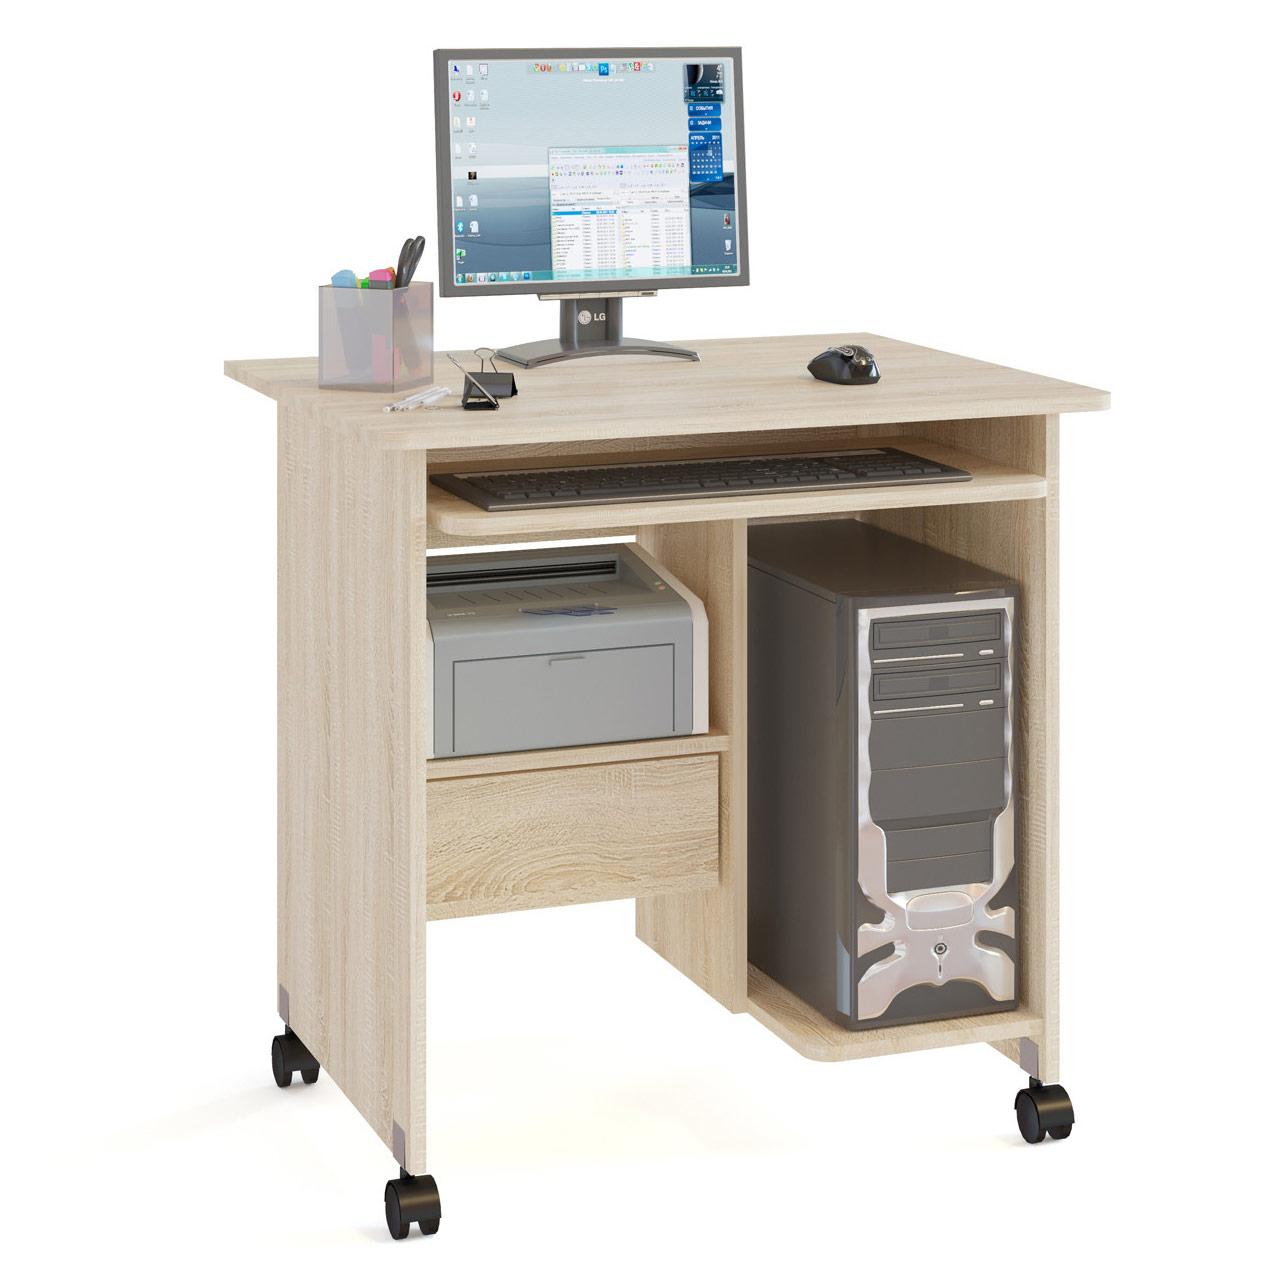 Компьютерный стол СОКОЛ КСТ-10.1 80x60x80, дуб сонома